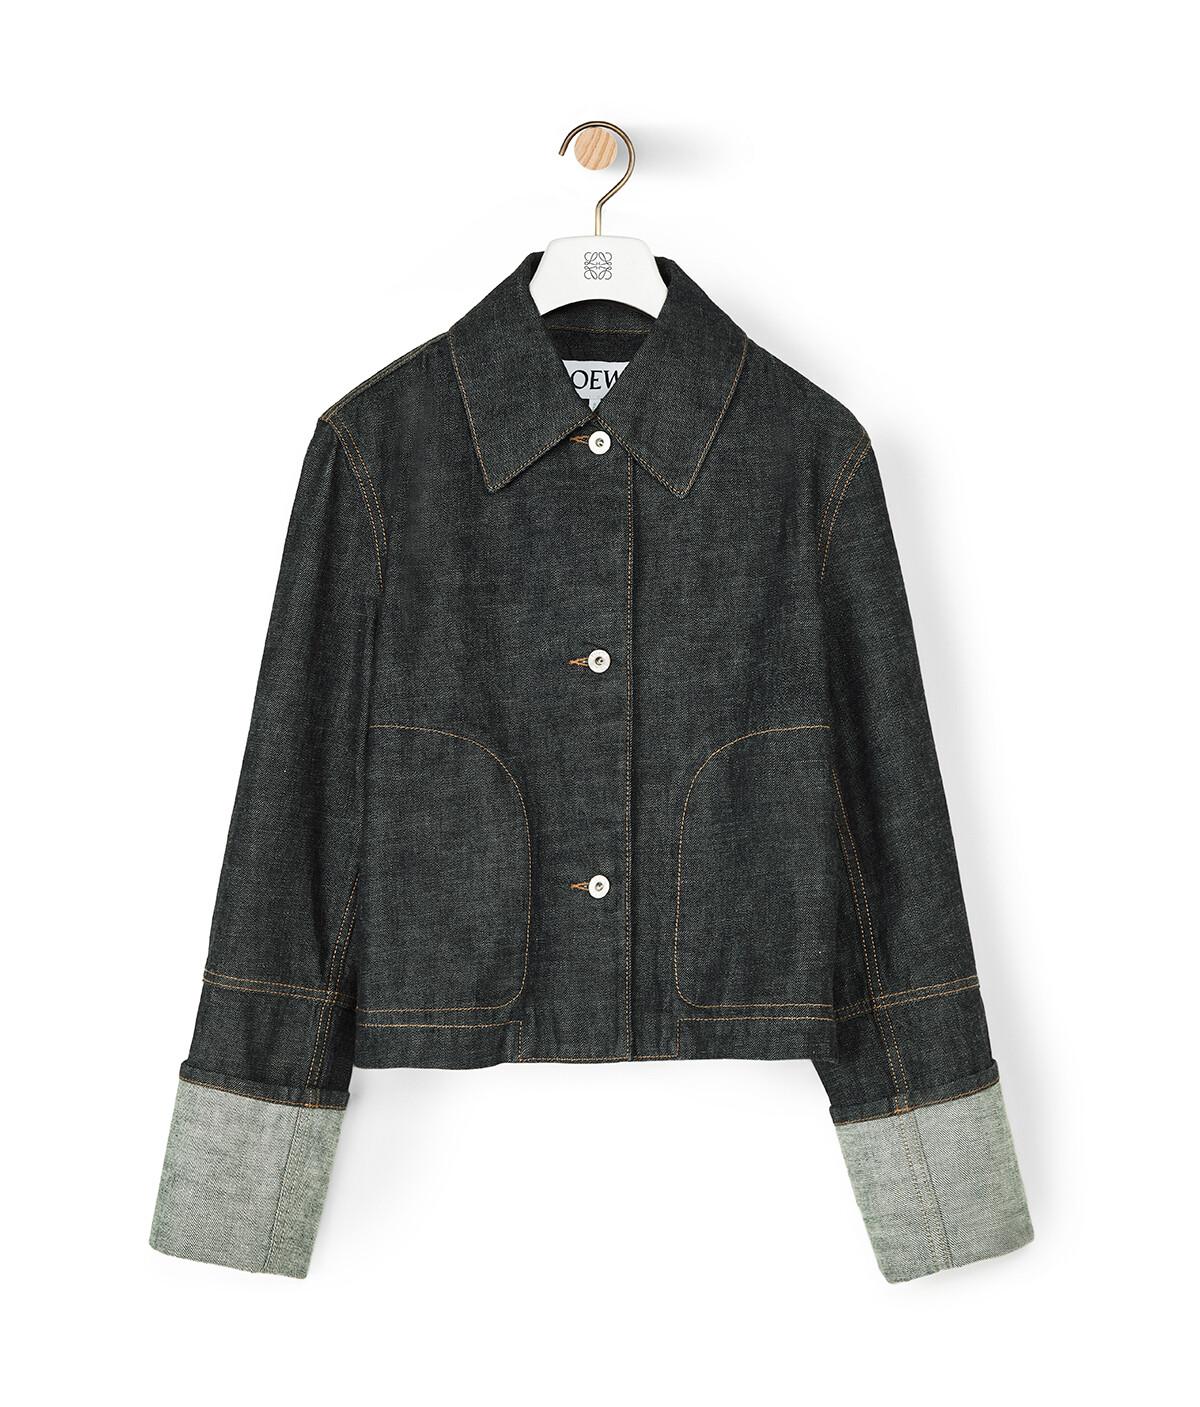 LOEWE Denim Cropped Jacket Indigo front